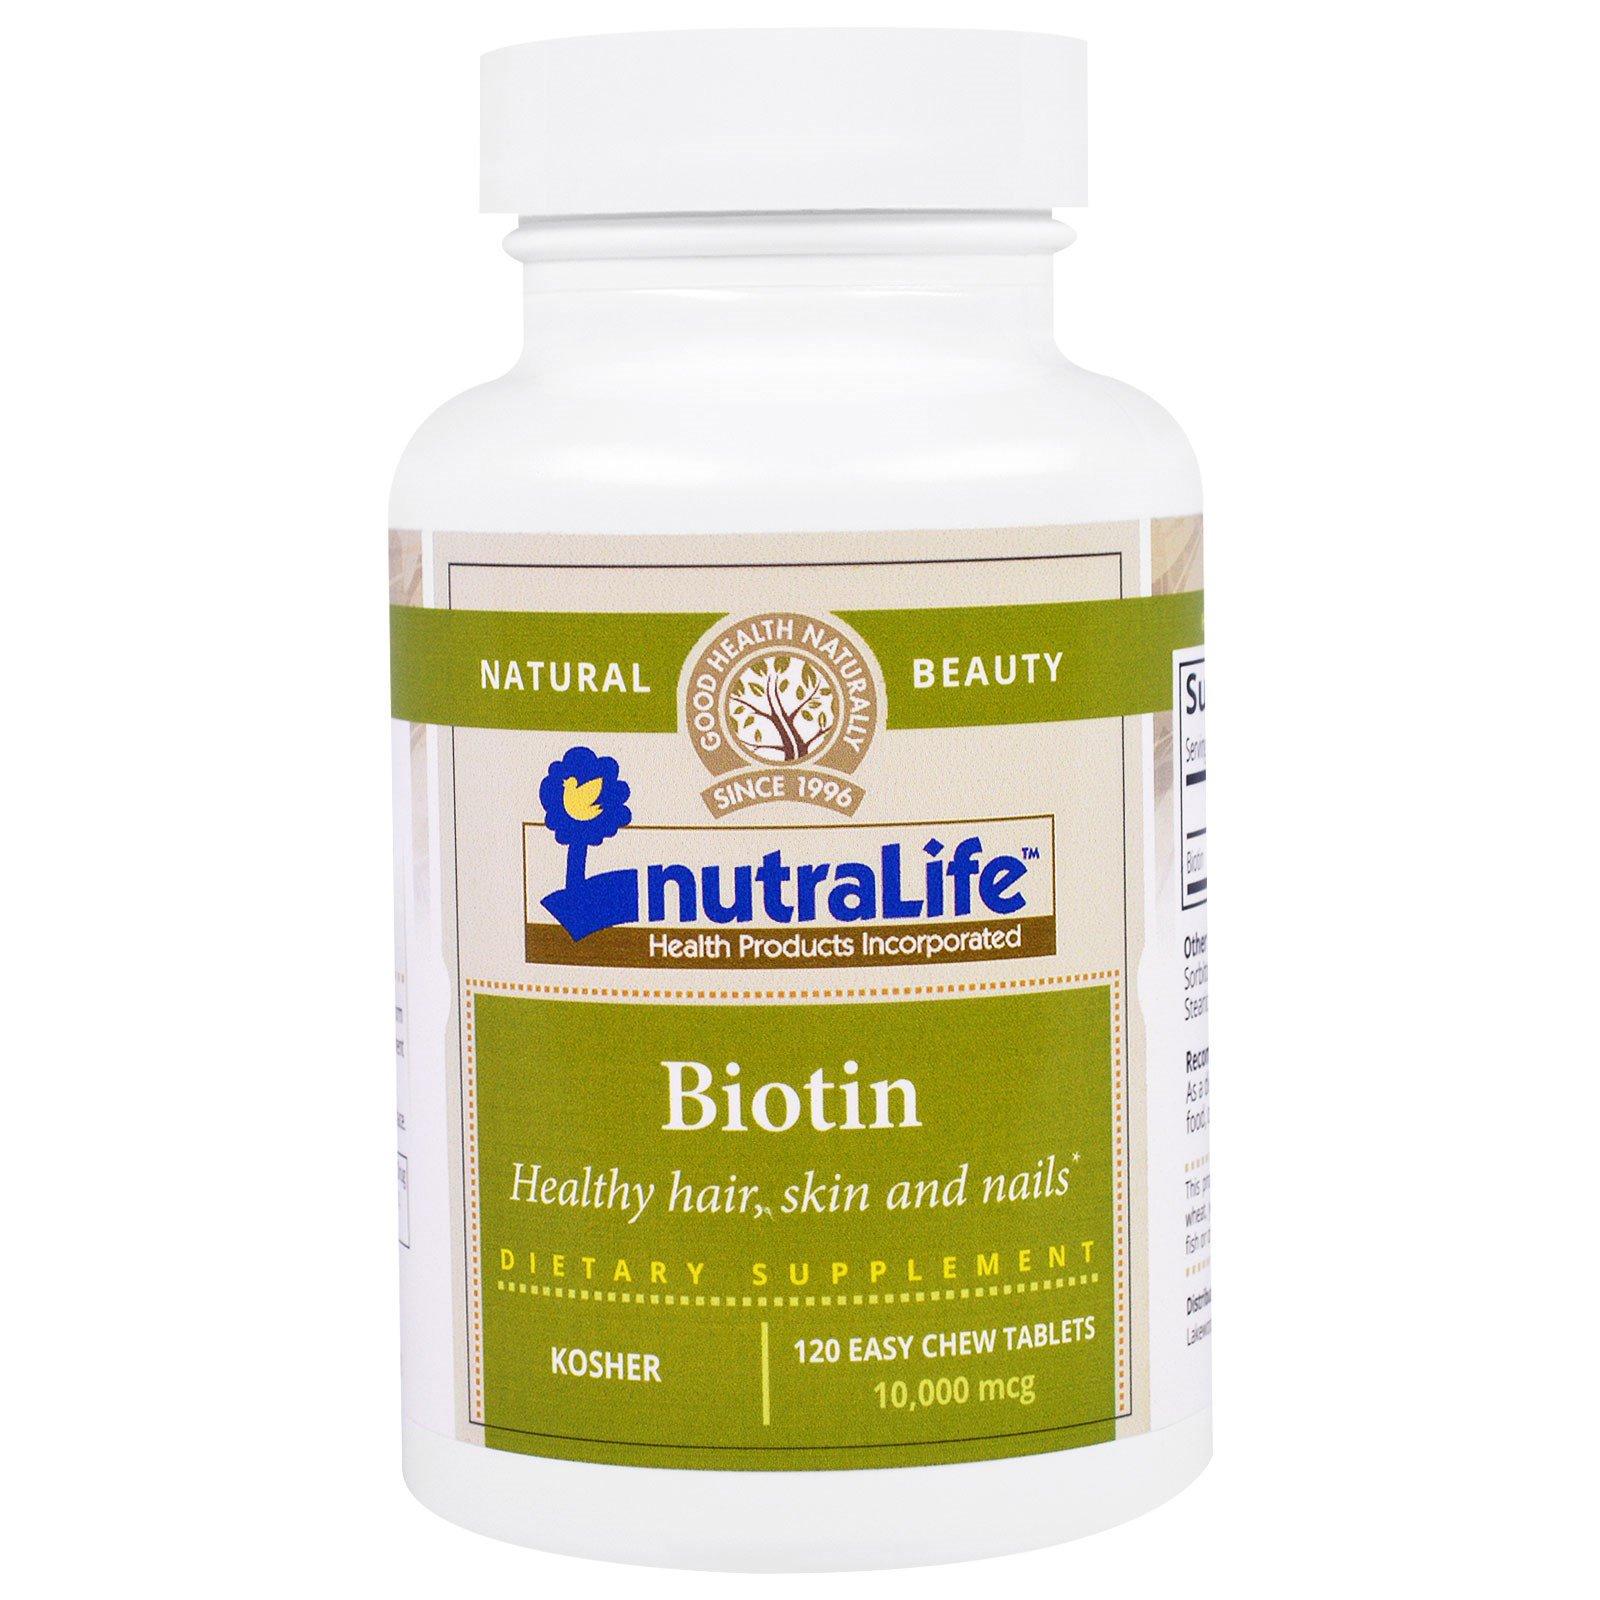 Nutralife Biotin 10000 Mcg 120 Easy Chew Tablets 100 Natrol